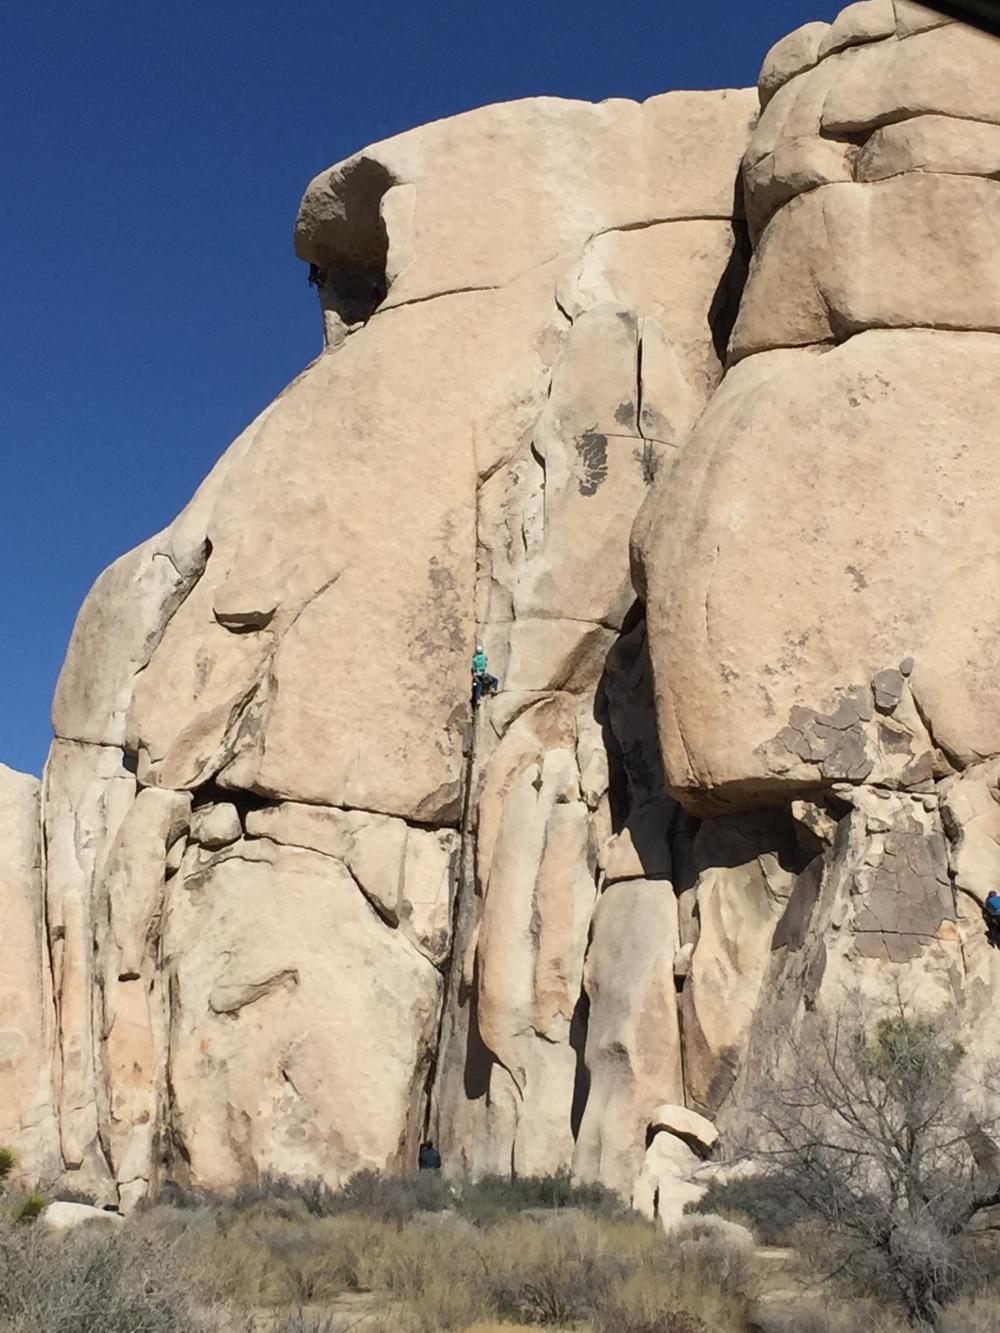 012-rock climbers